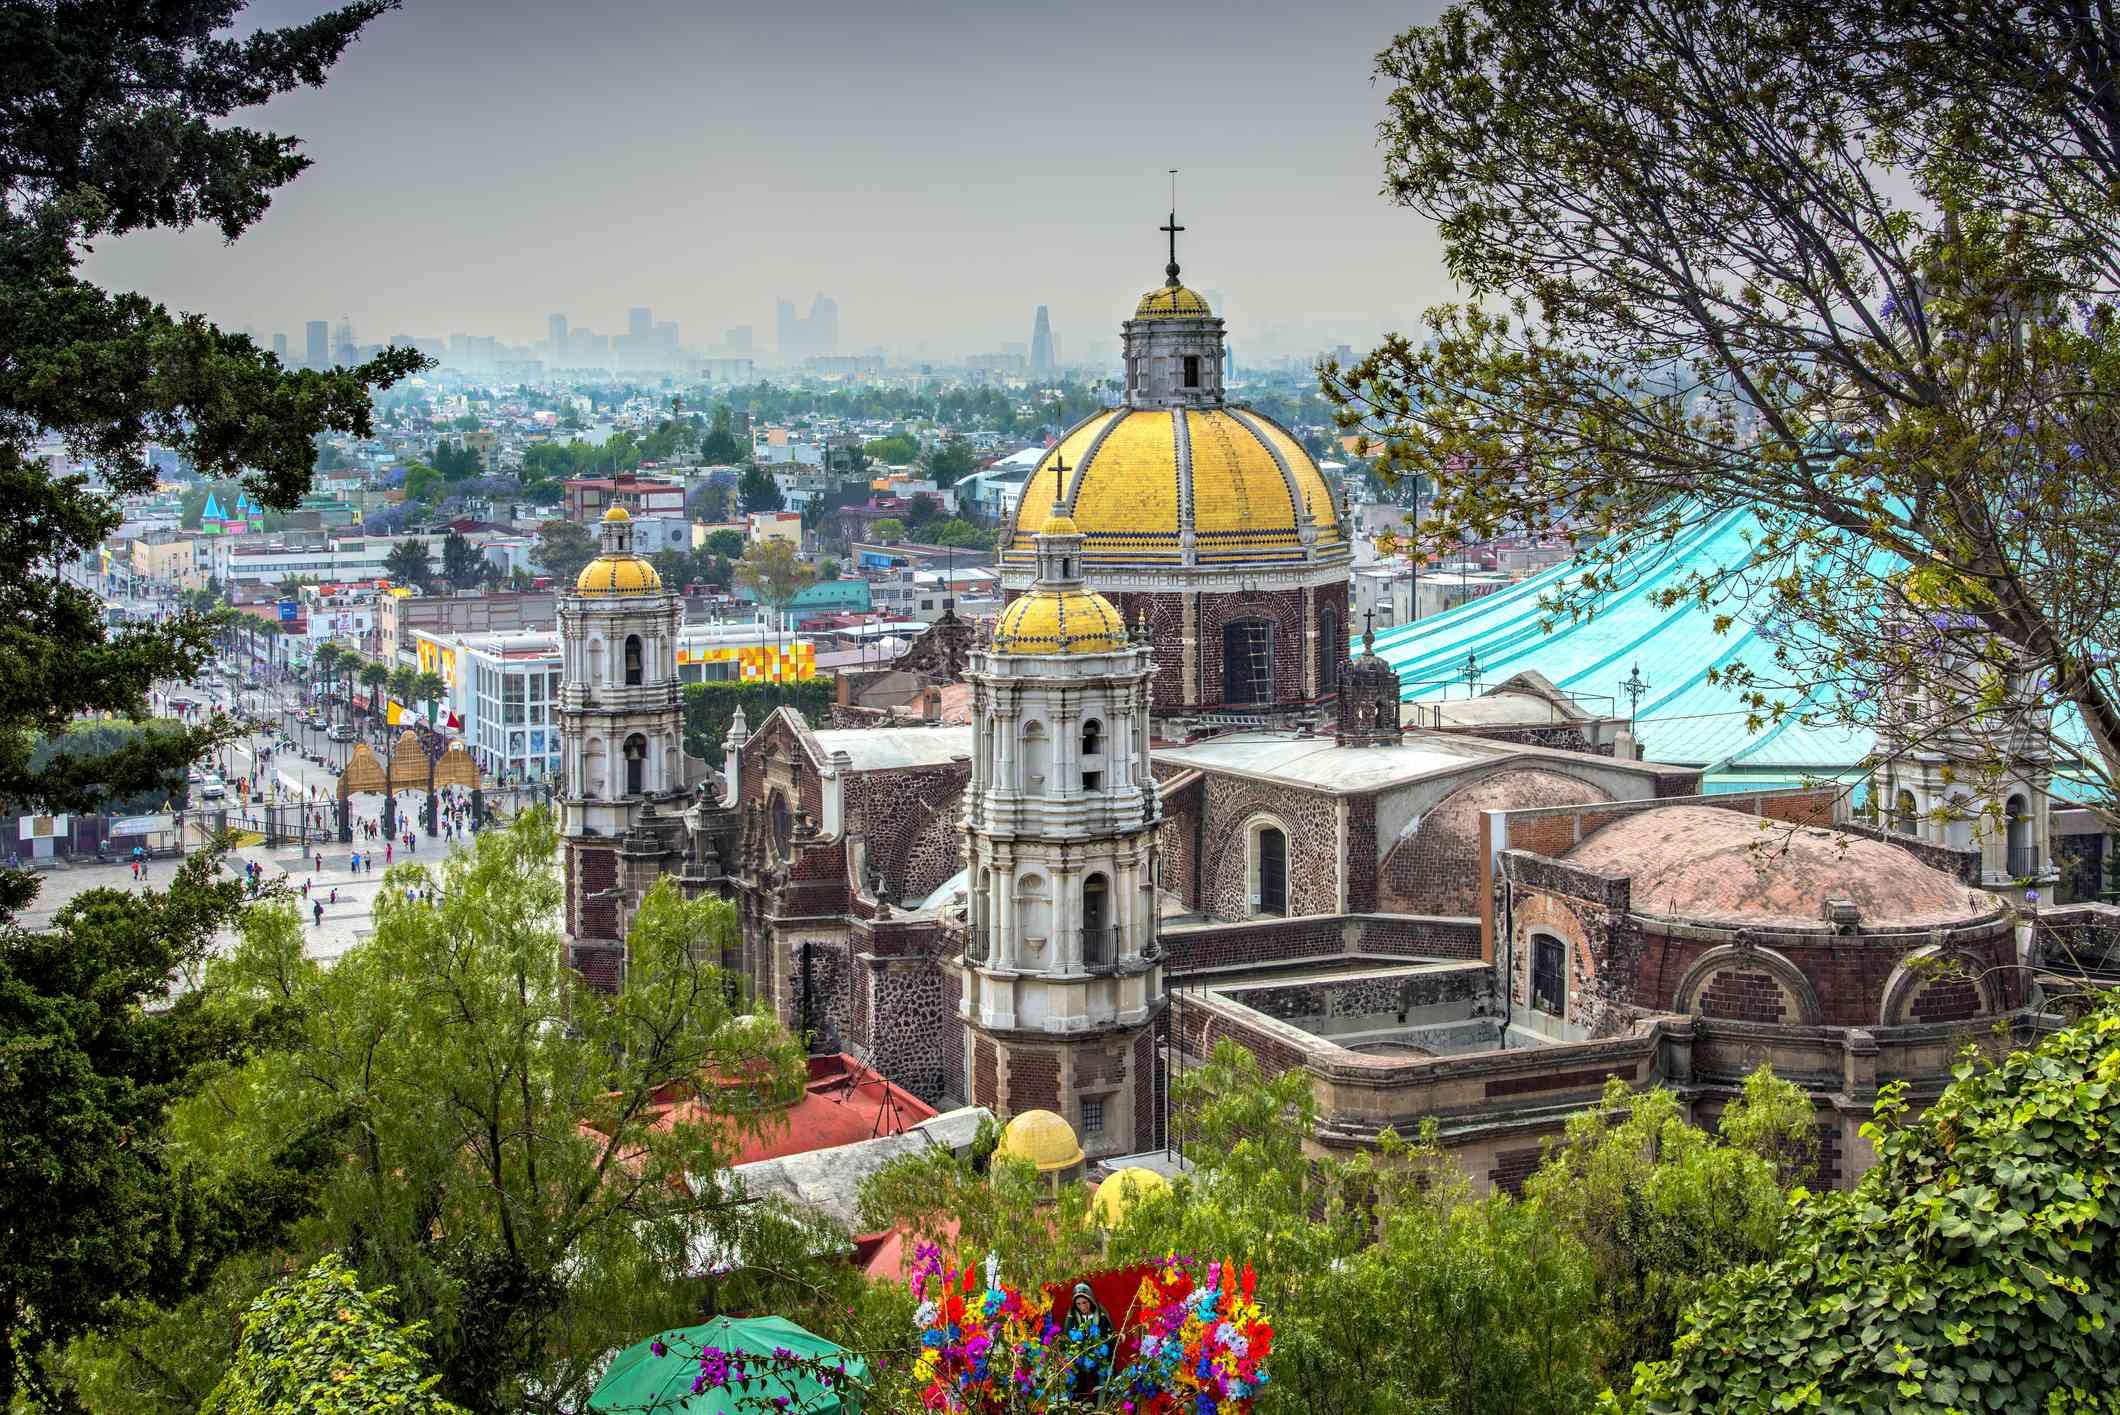 View of Mexico City skyline